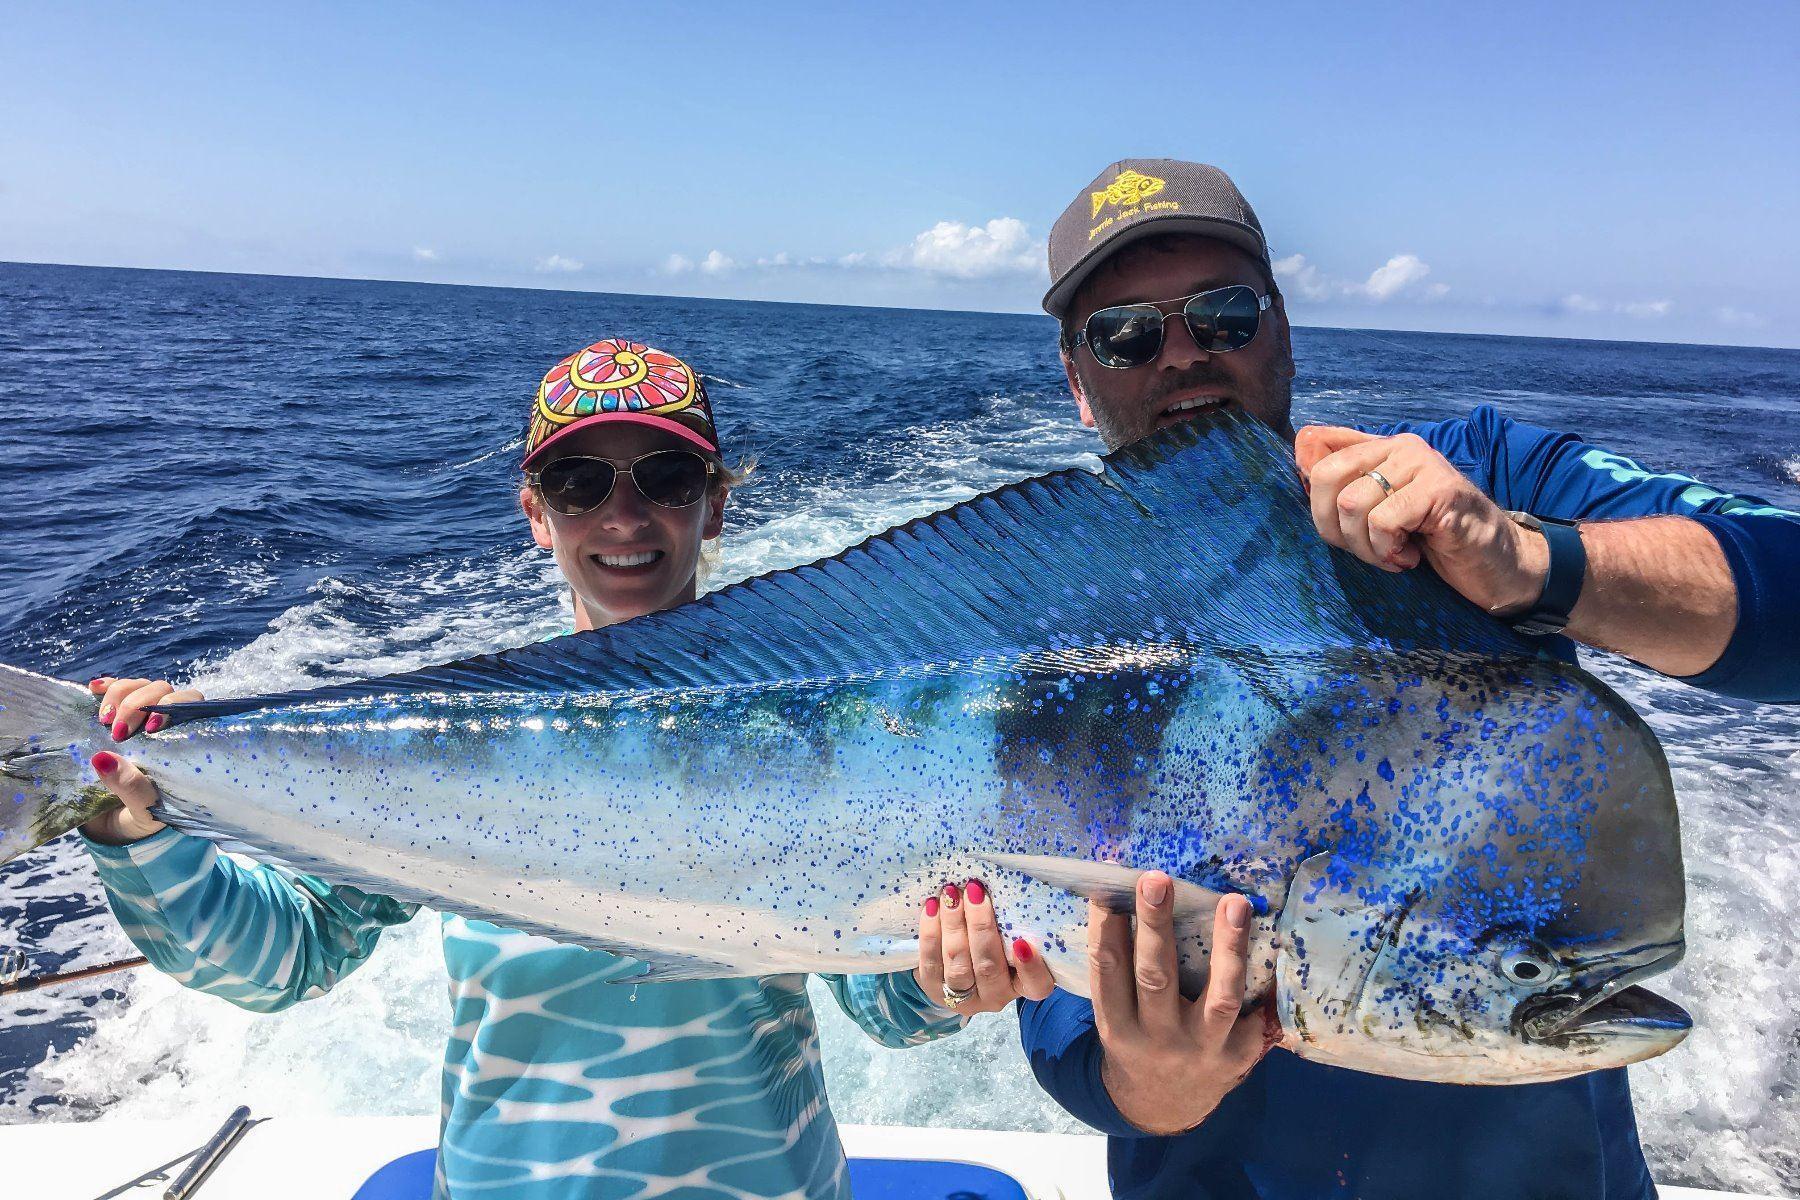 Costa Rica: 3 Day Saltwater Fishing Adventure Aboard the Dream Raiser Yacht